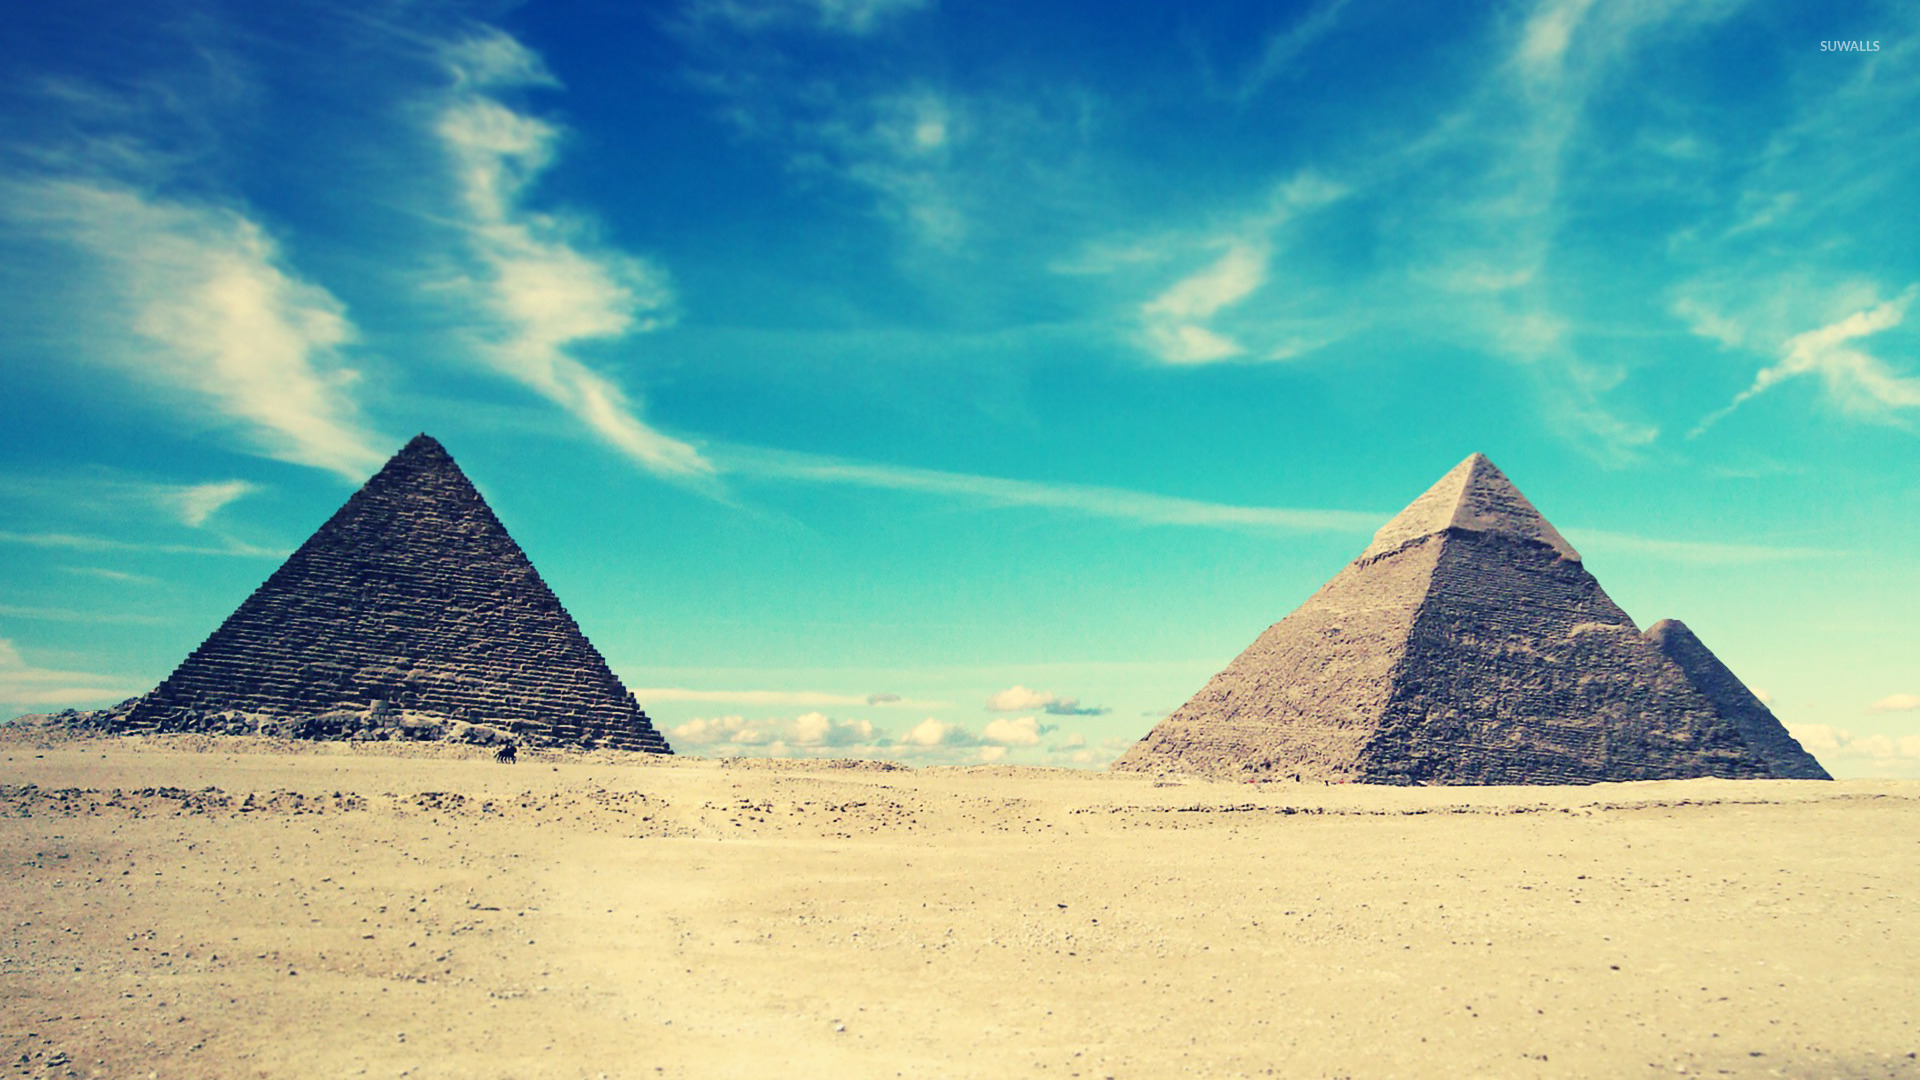 Egyptian pyramids wallpaper   World wallpapers   16365 1920x1080